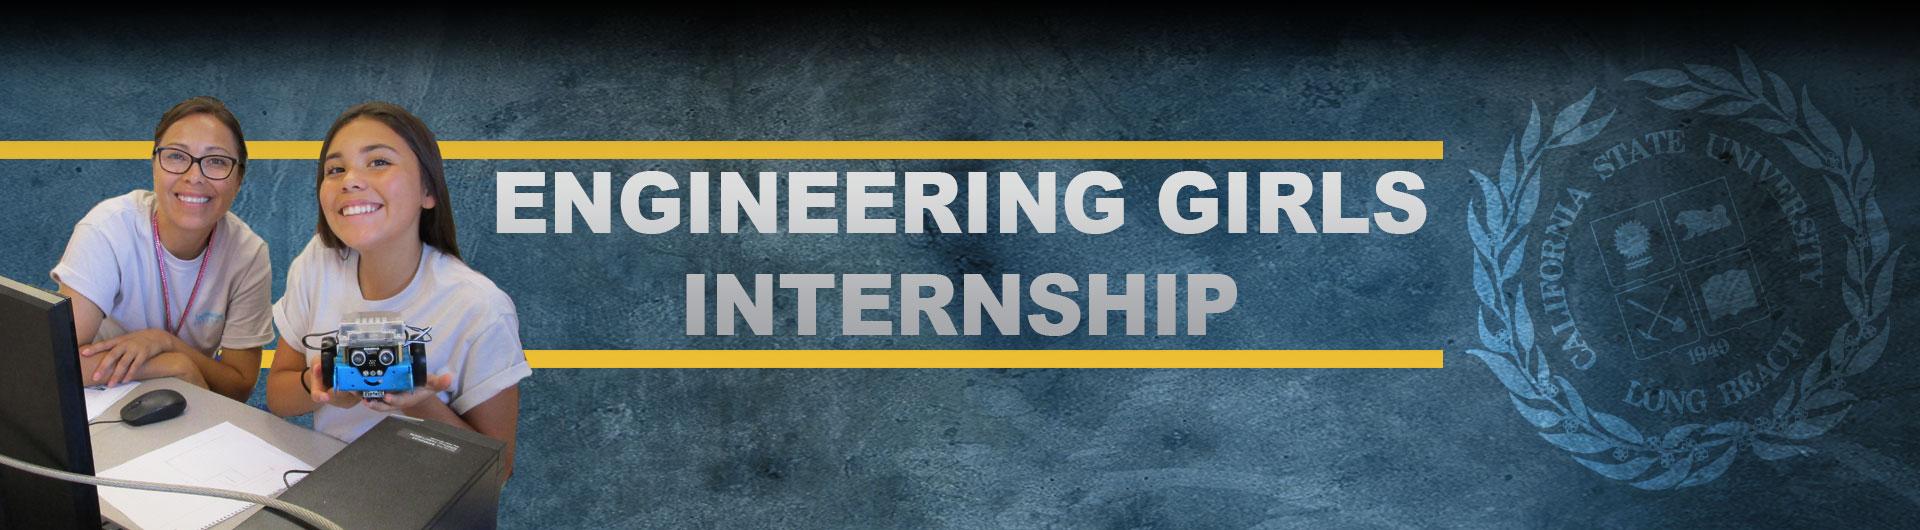 Engineering Girls Internship